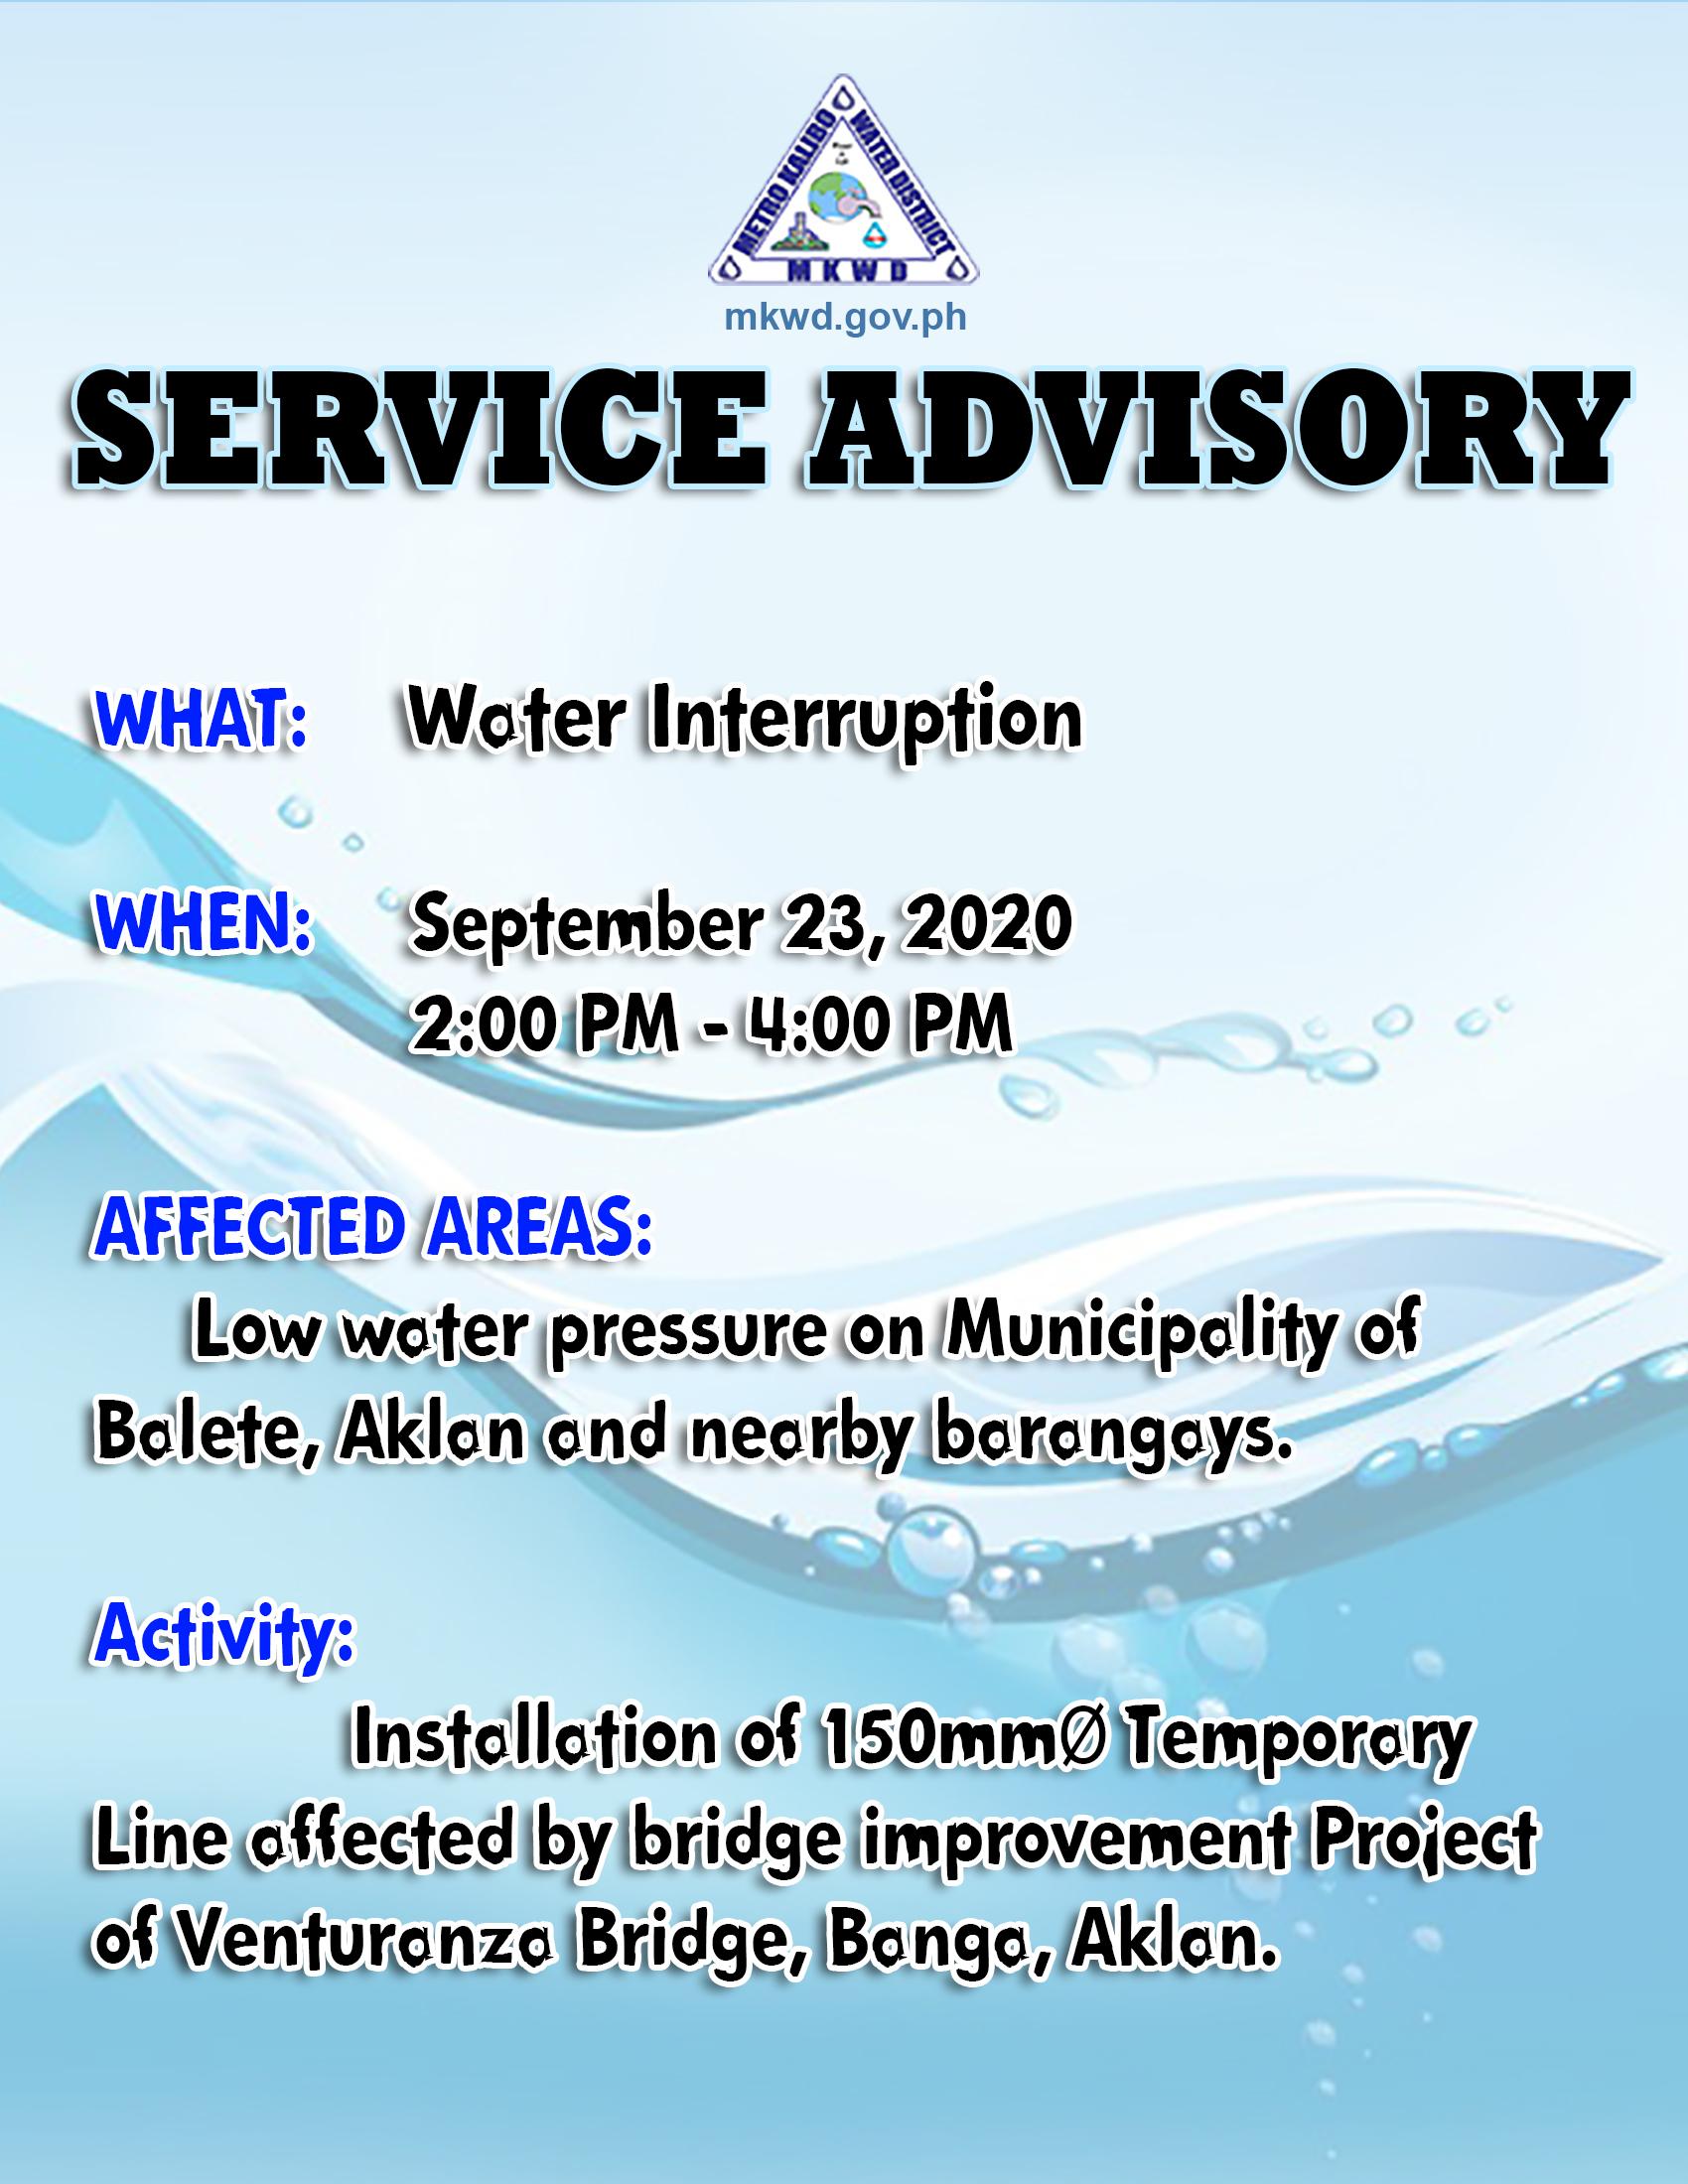 Water Interruption: September 23, 2020